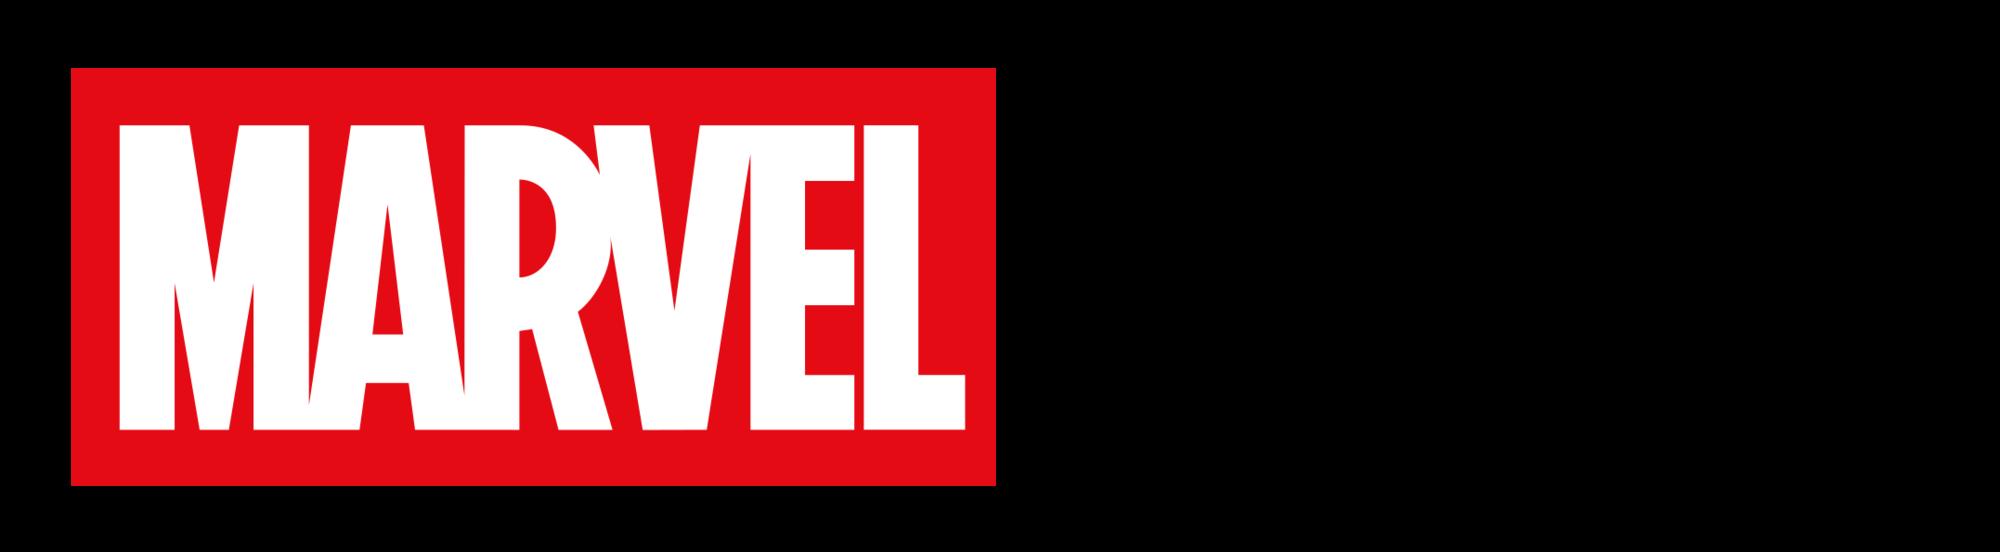 Marvel_Studios_logo_2016.png